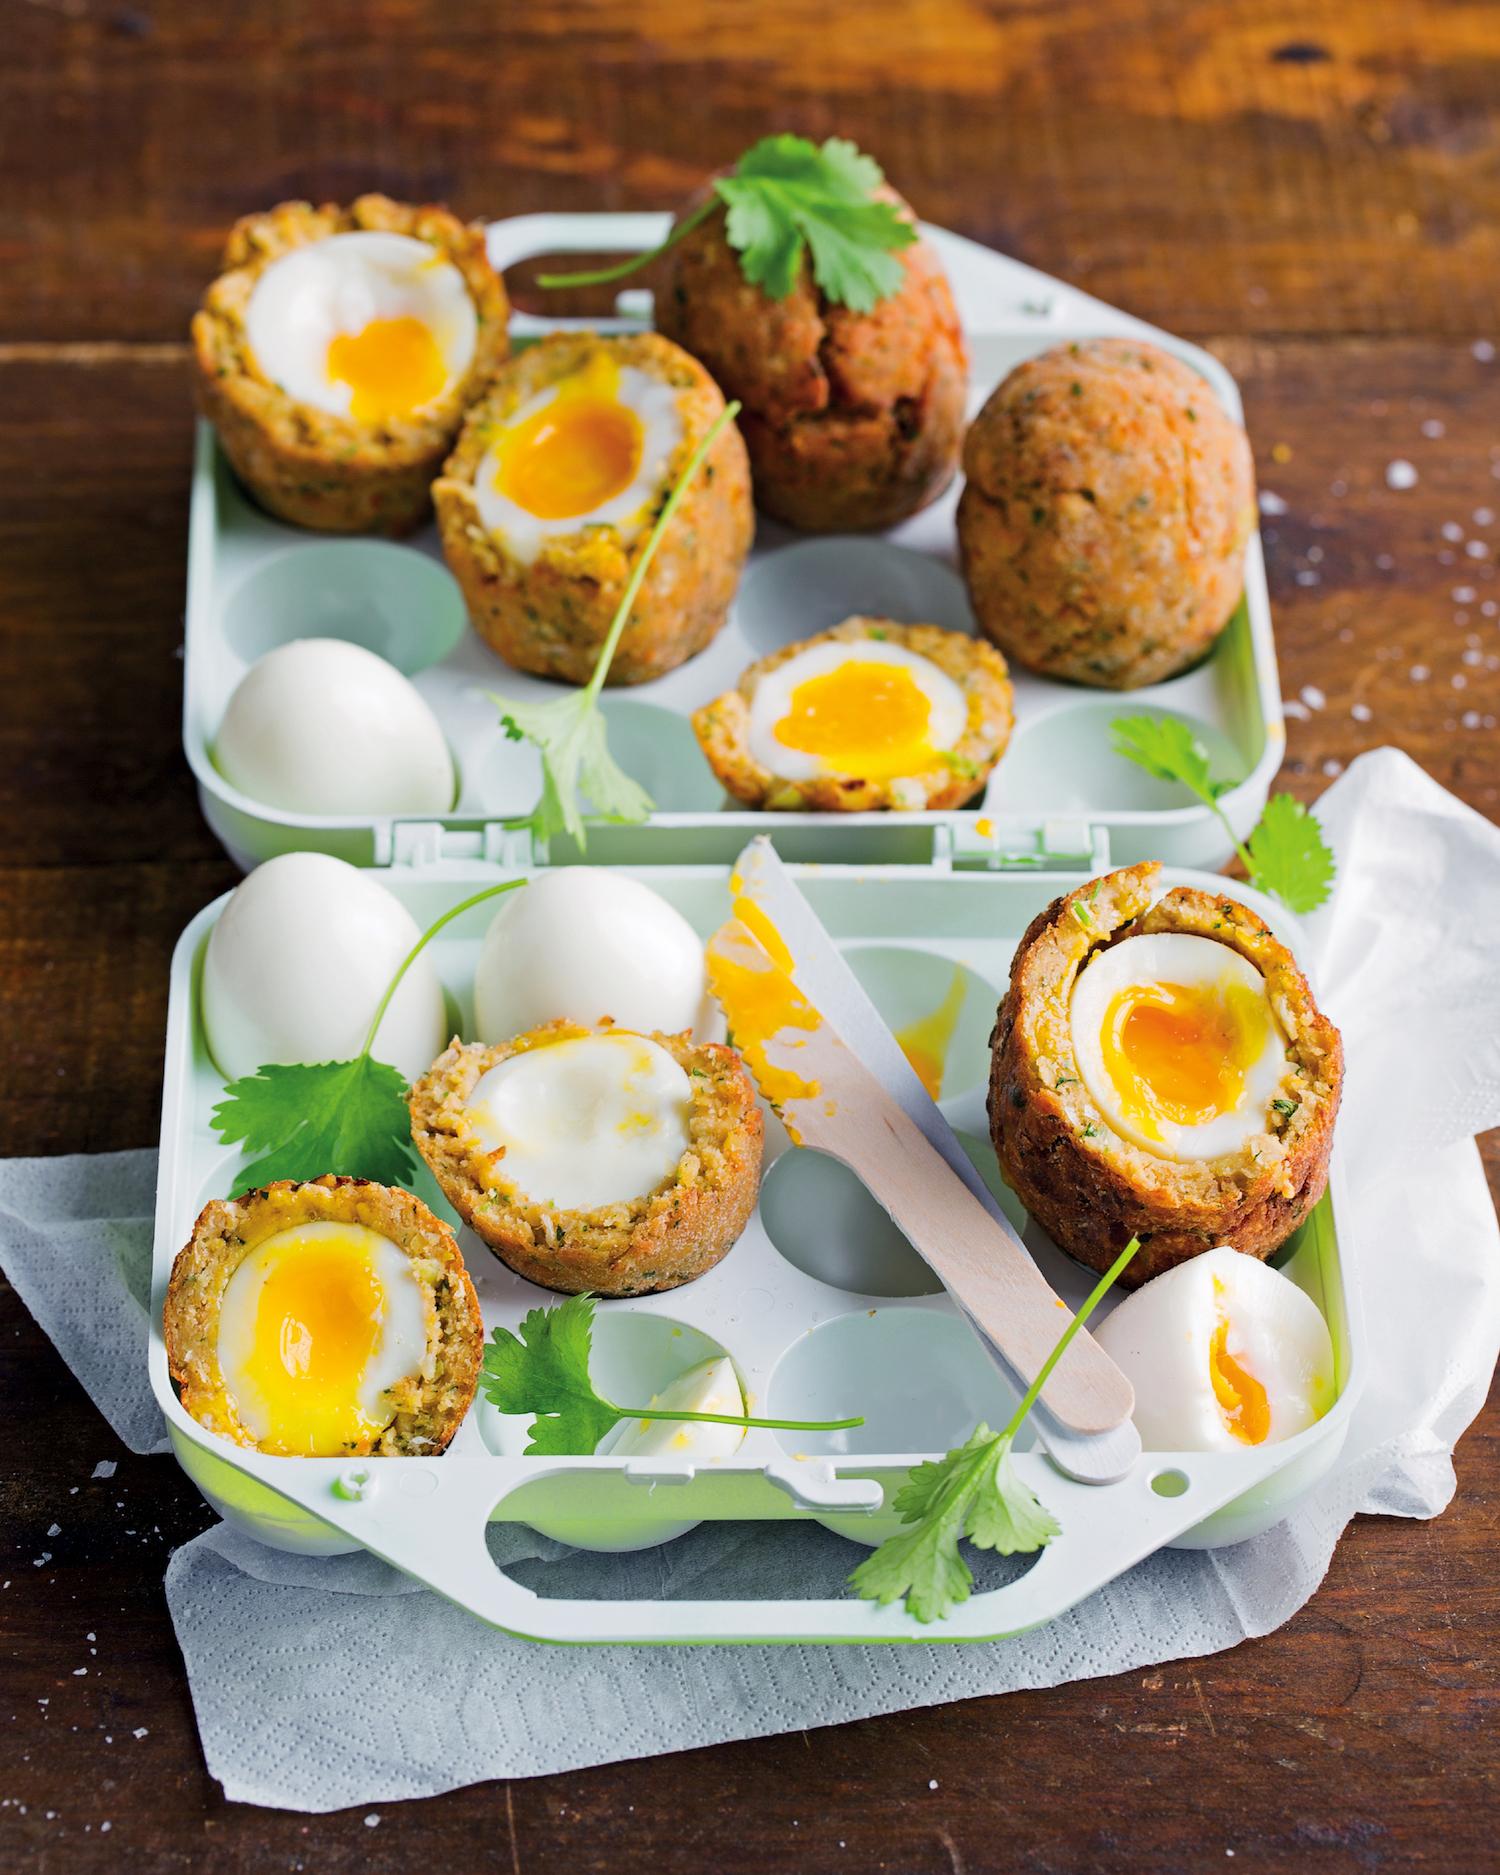 Falafel Scotch eggs